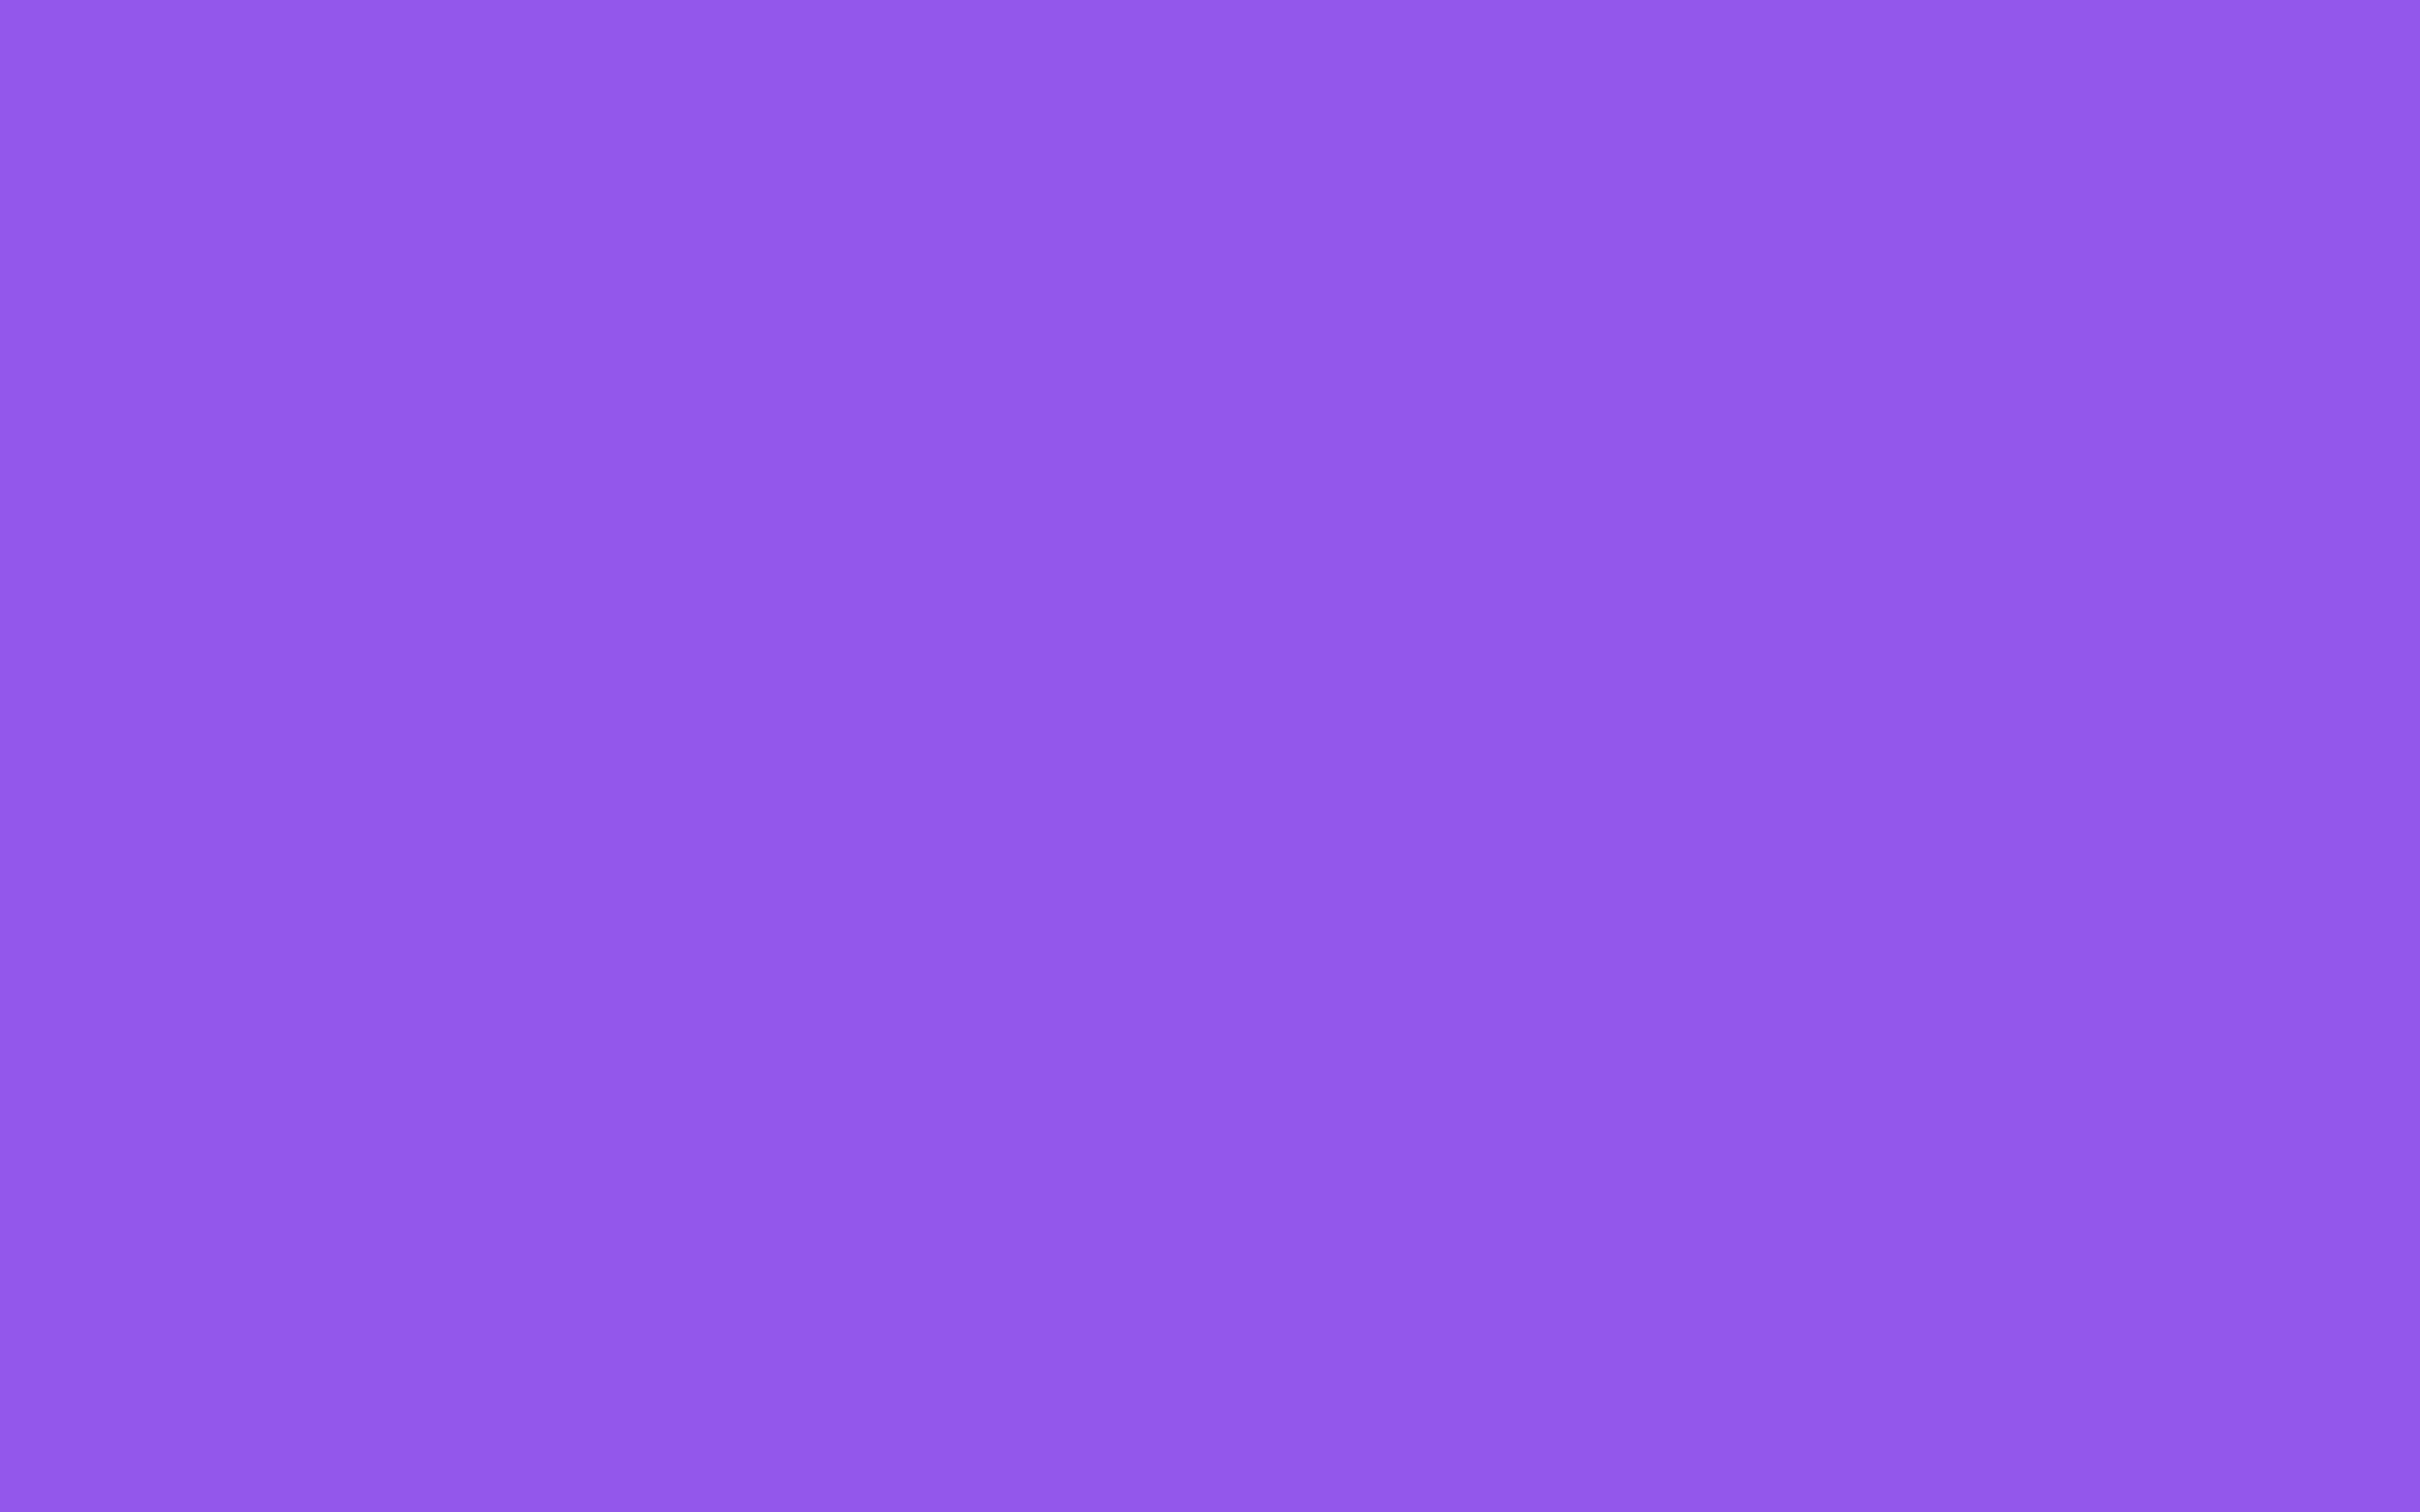 2560x1600 lavender indigo solid color background - Wallpaper lavender color ...